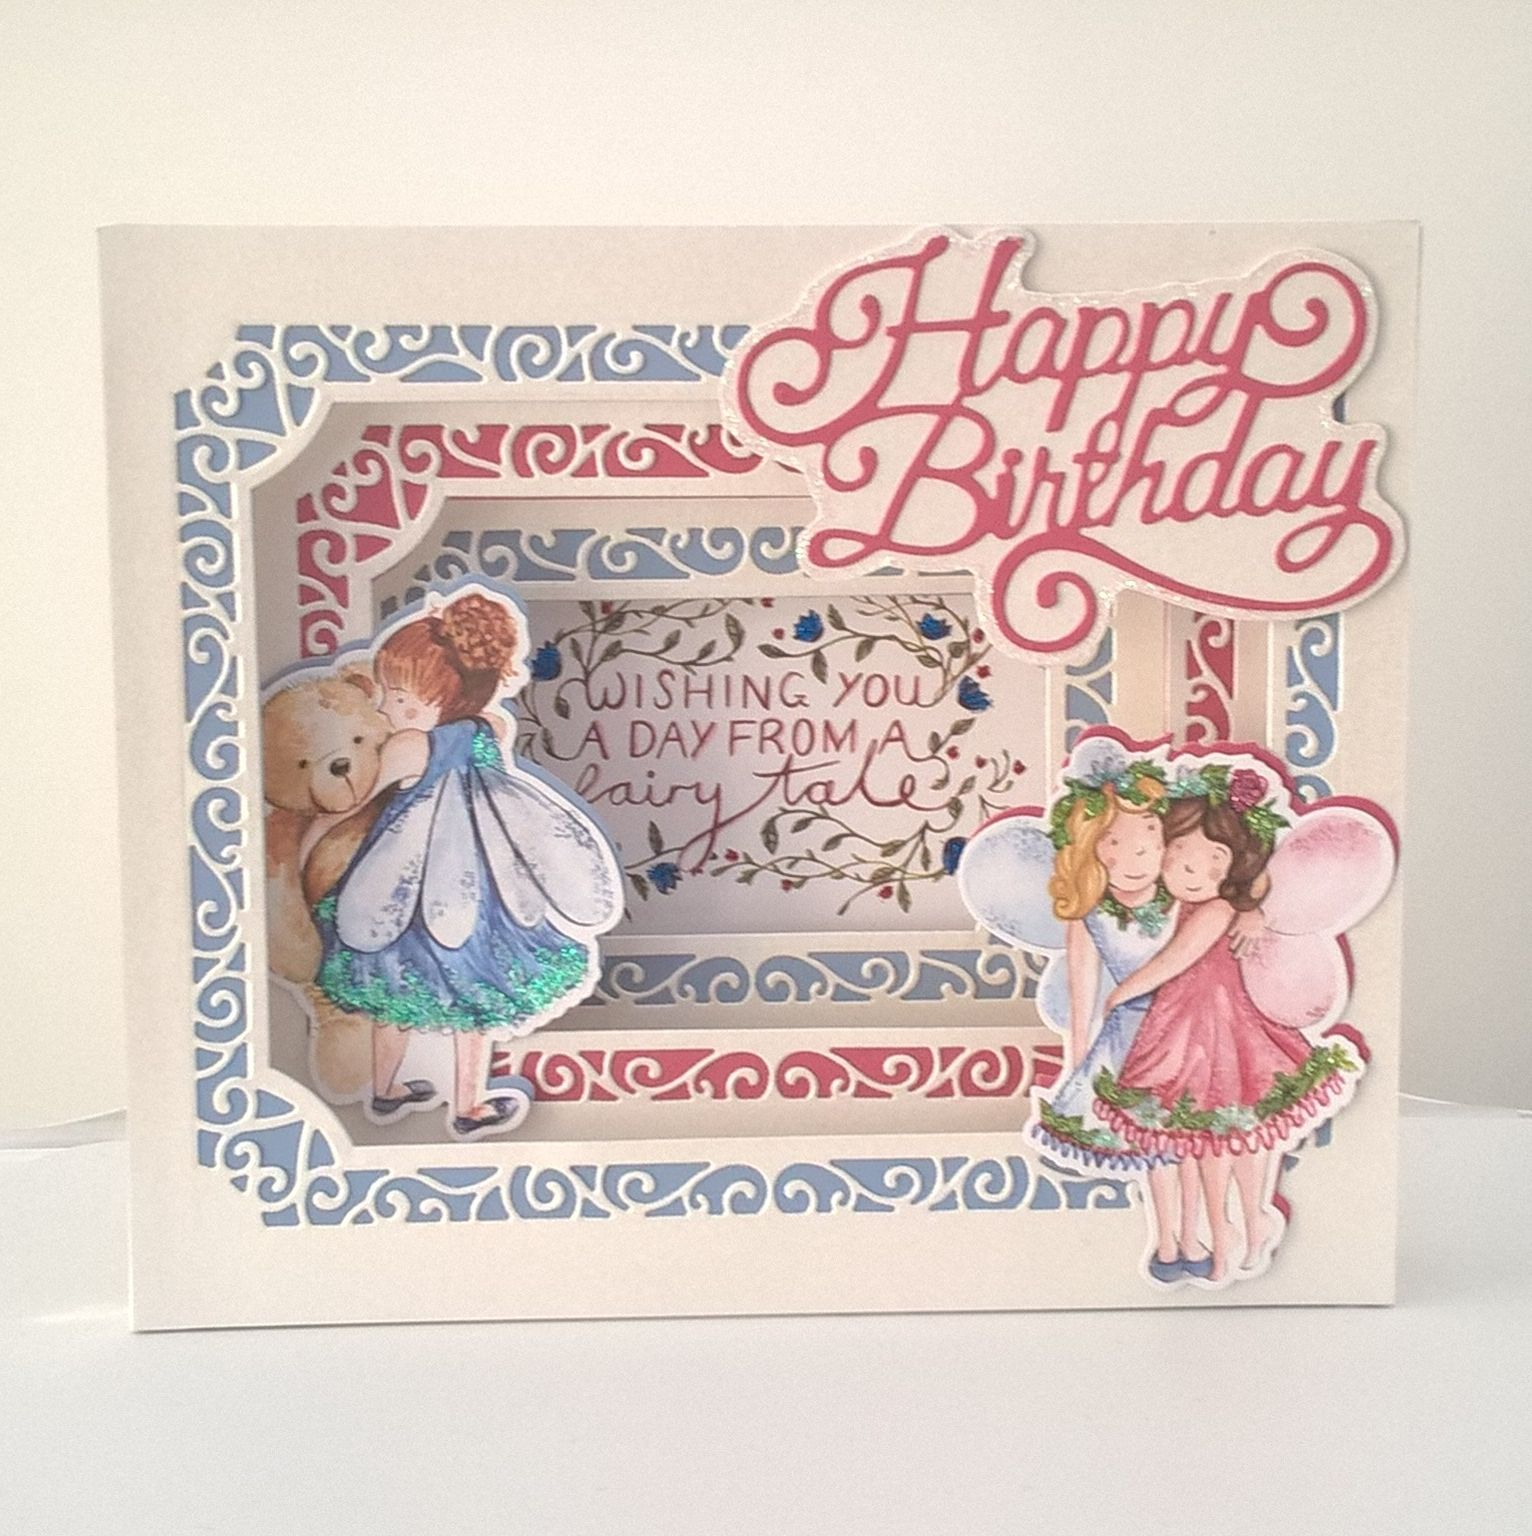 Shadow Box Birthday Card Made Using Tonic Studios Dies And Fairies Creative Cards Card Making Birthday Card Creator